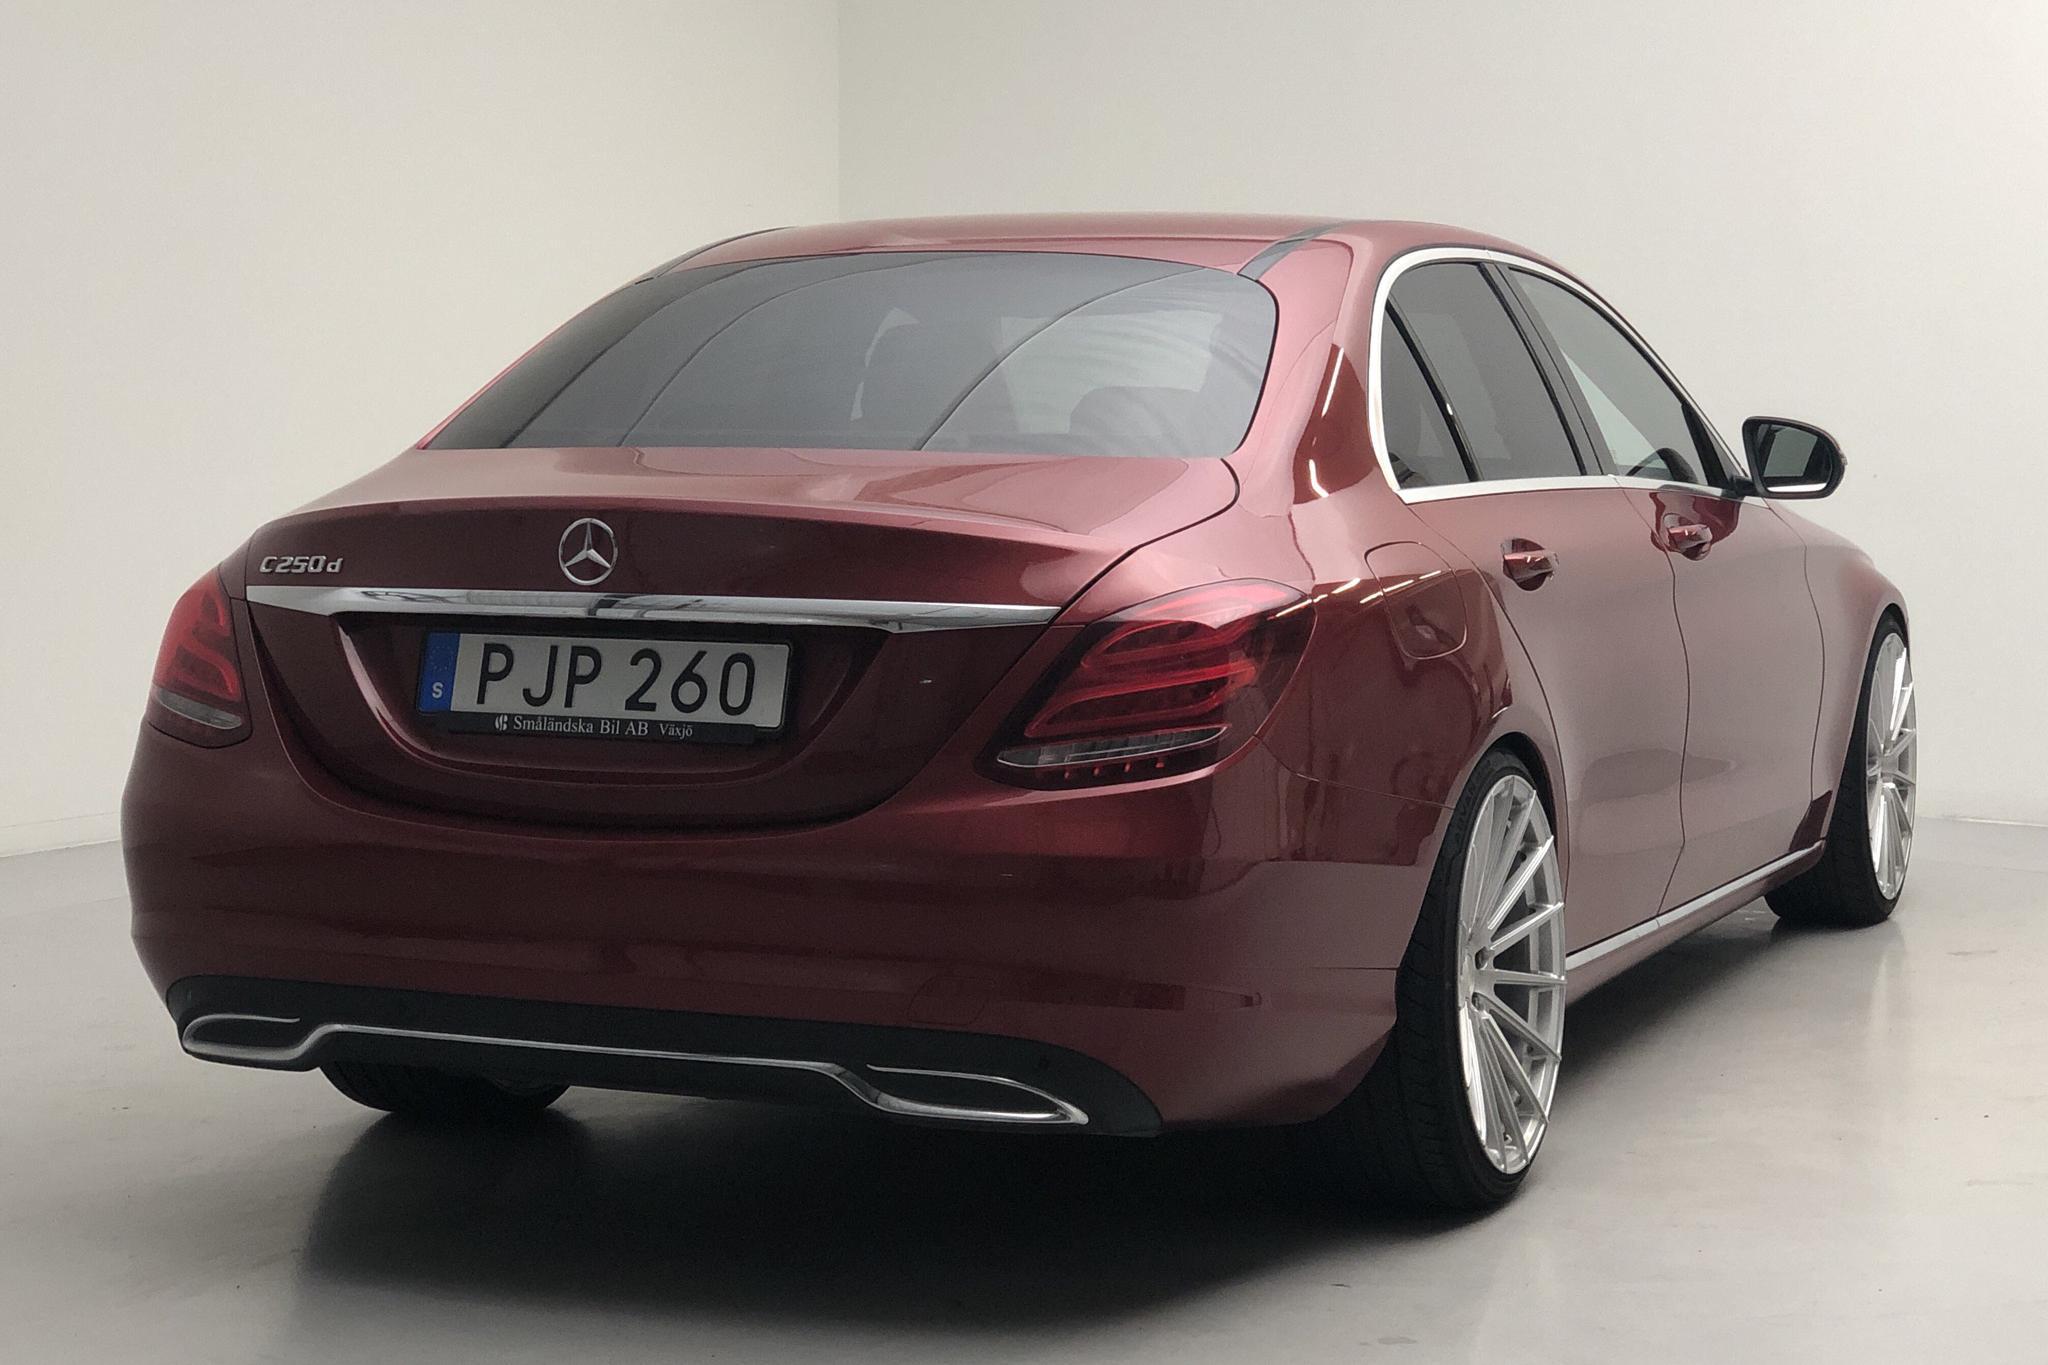 Mercedes C 250 d W205 (204hk) - 8 972 mil - Automat - röd - 2017